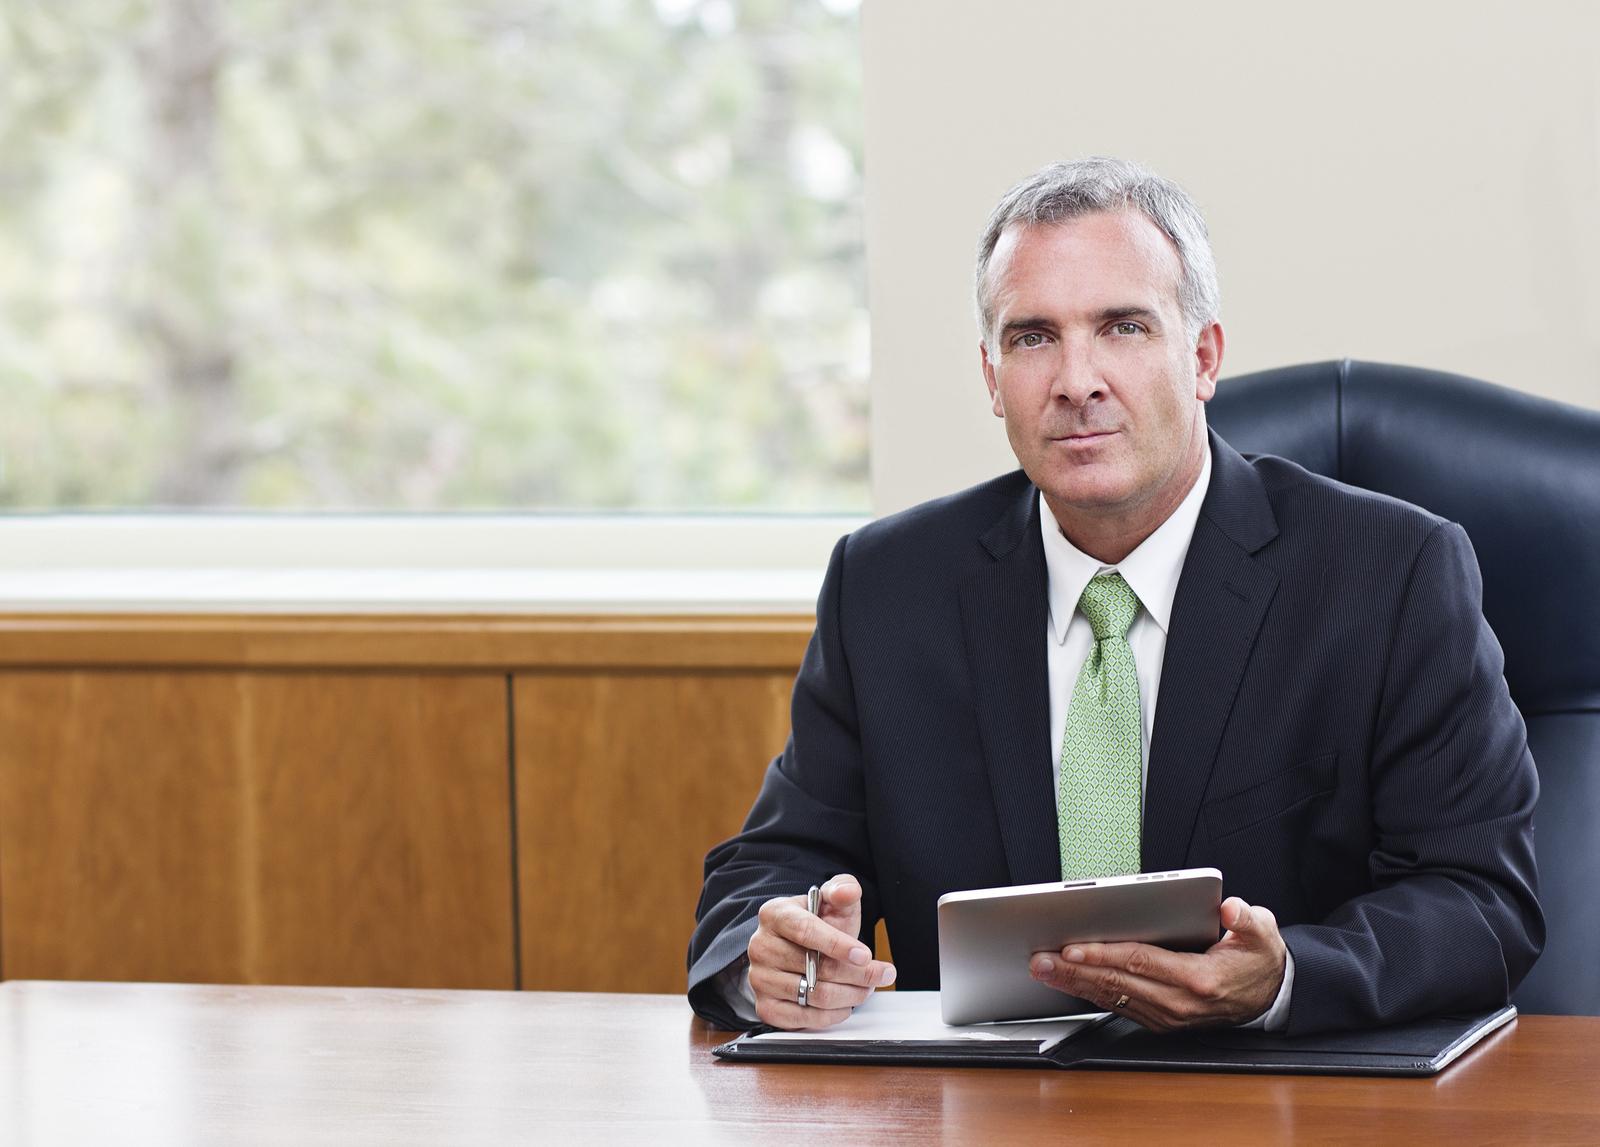 bigstock-Mature-Businessman-using-table-56107859